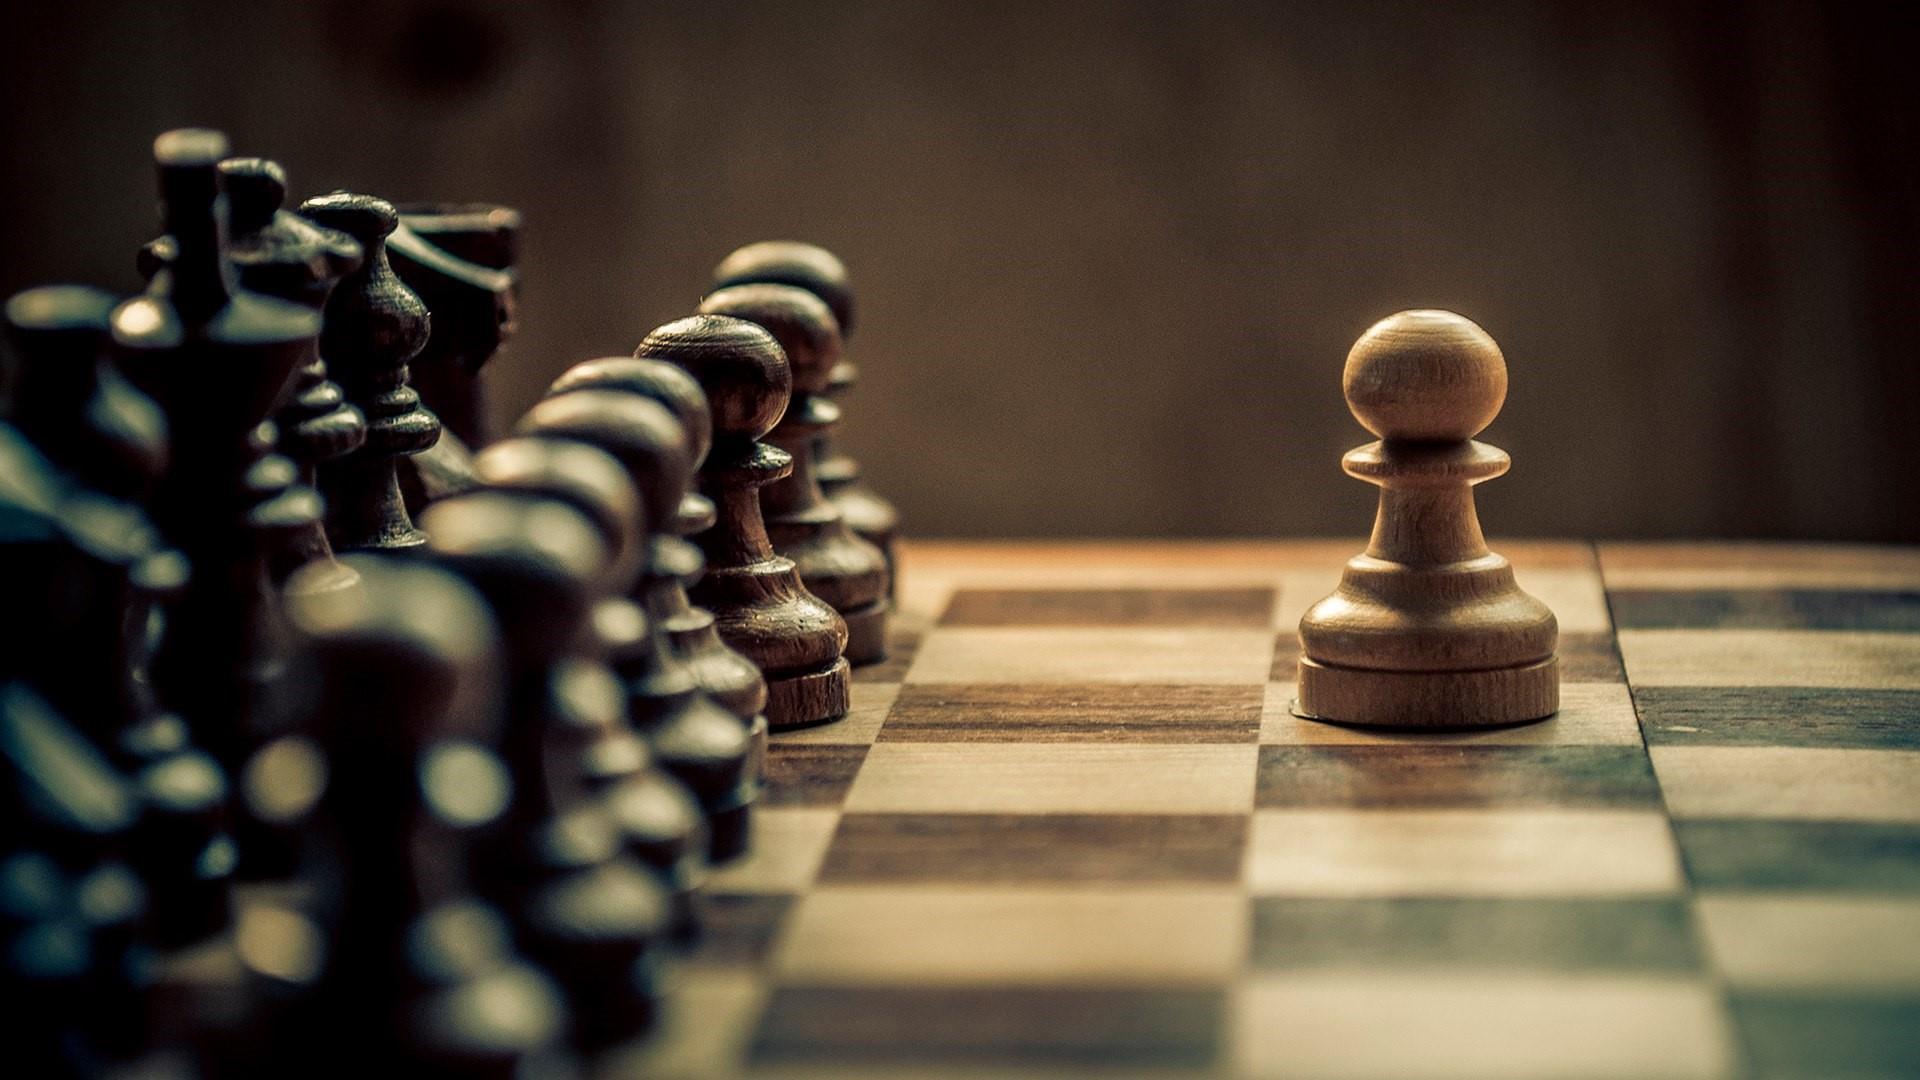 White Pawn (Chess) wallpaper